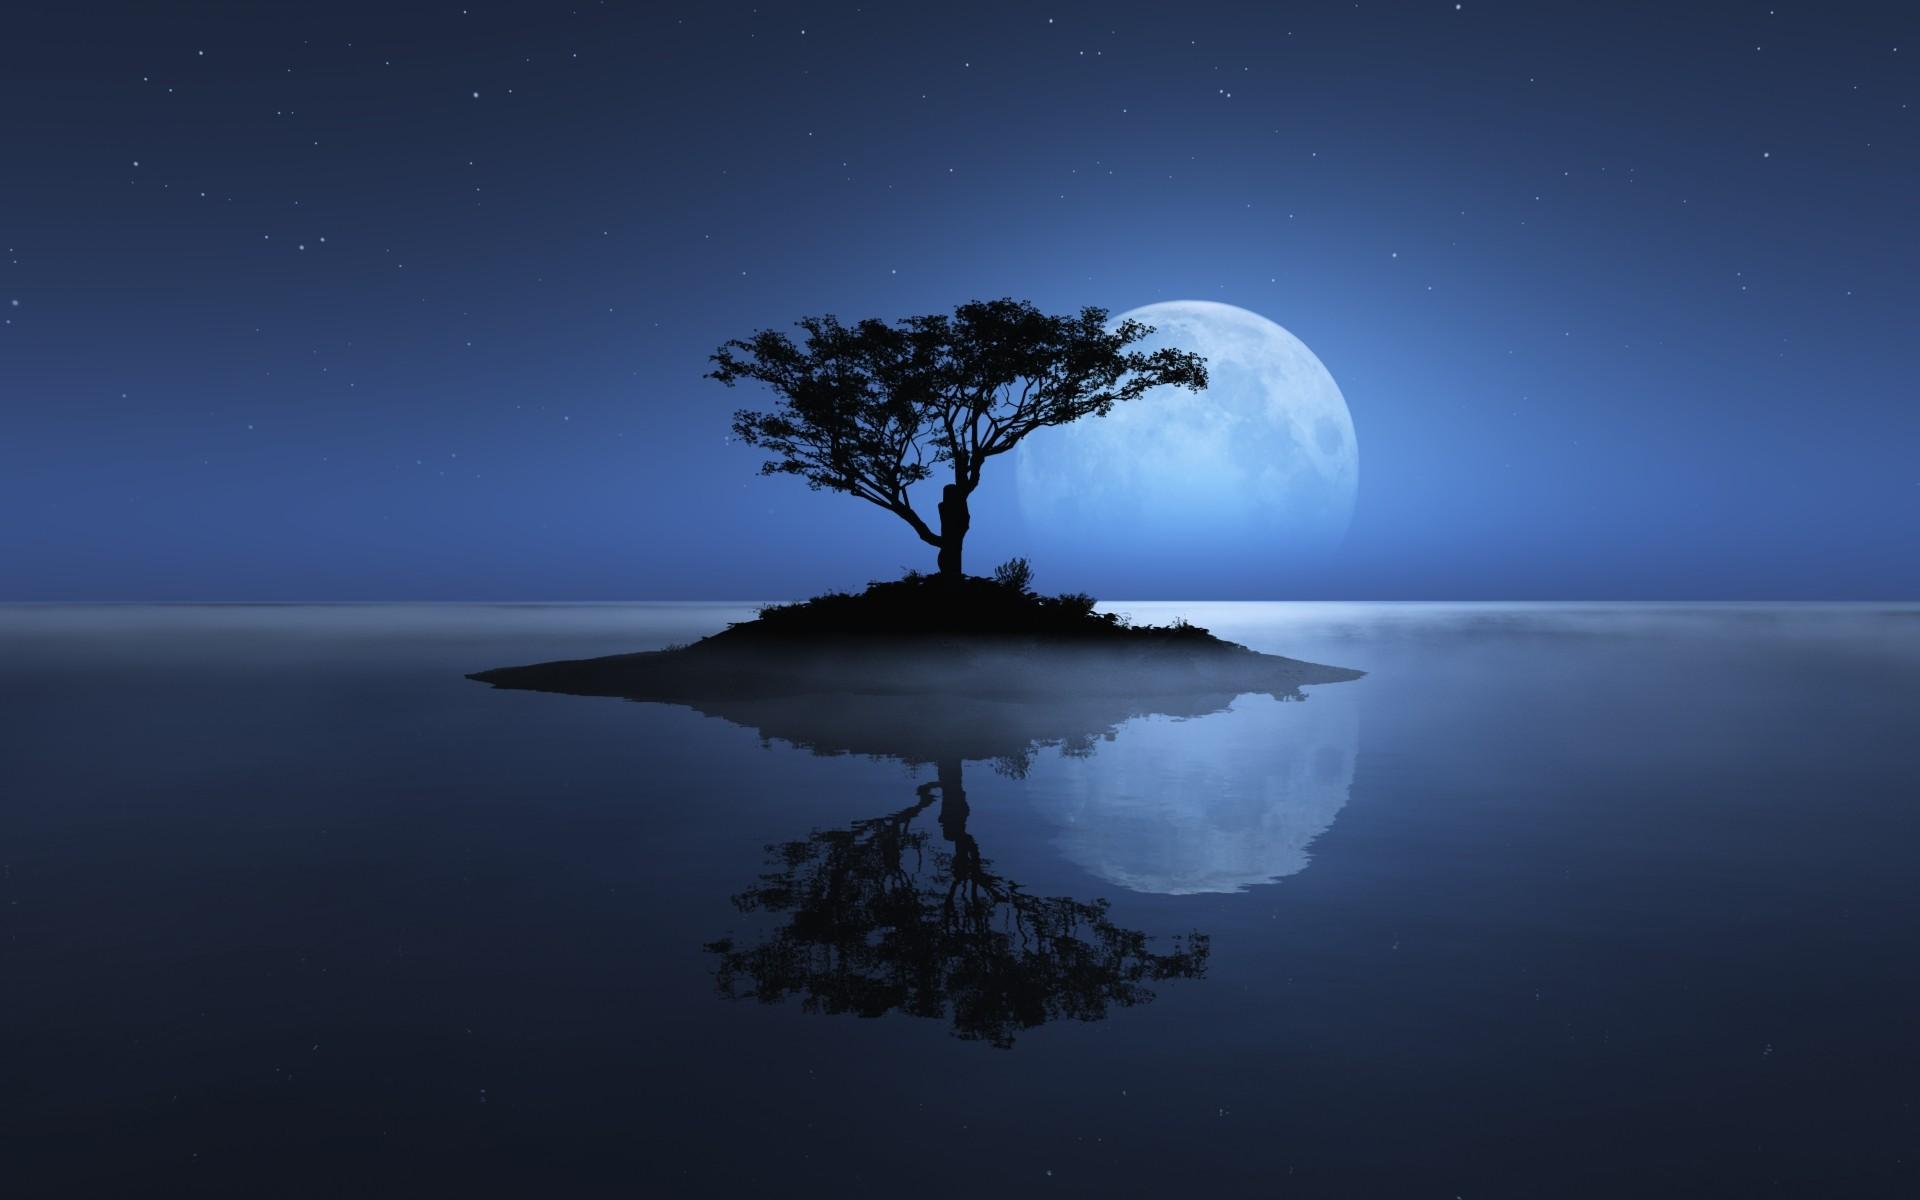 Papel De Parede Luz Solar Mar Noite Natureza Reflexao Ceu